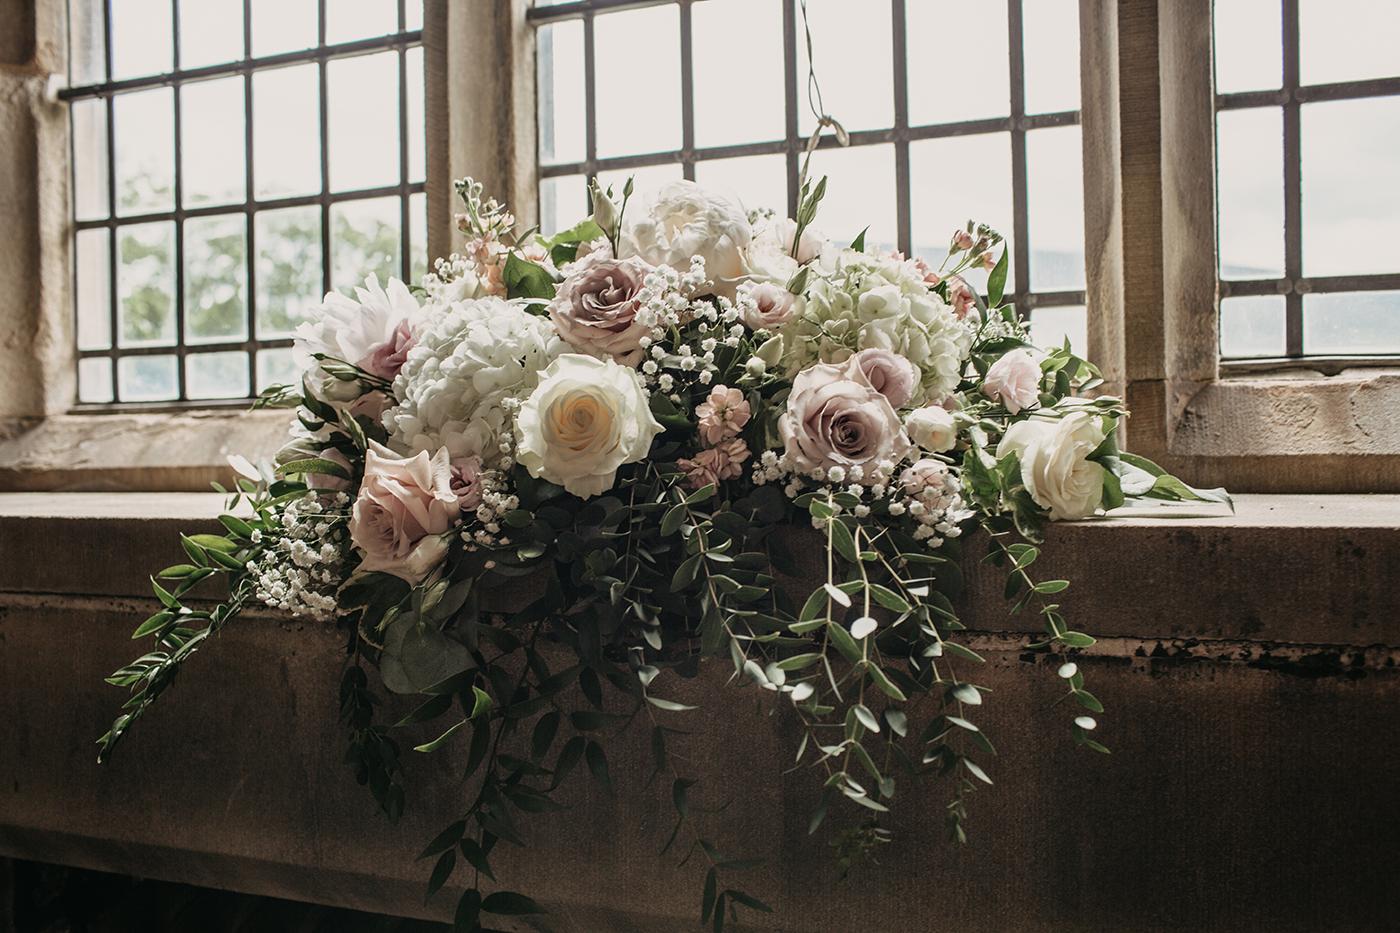 st leonards downham wedding photographer